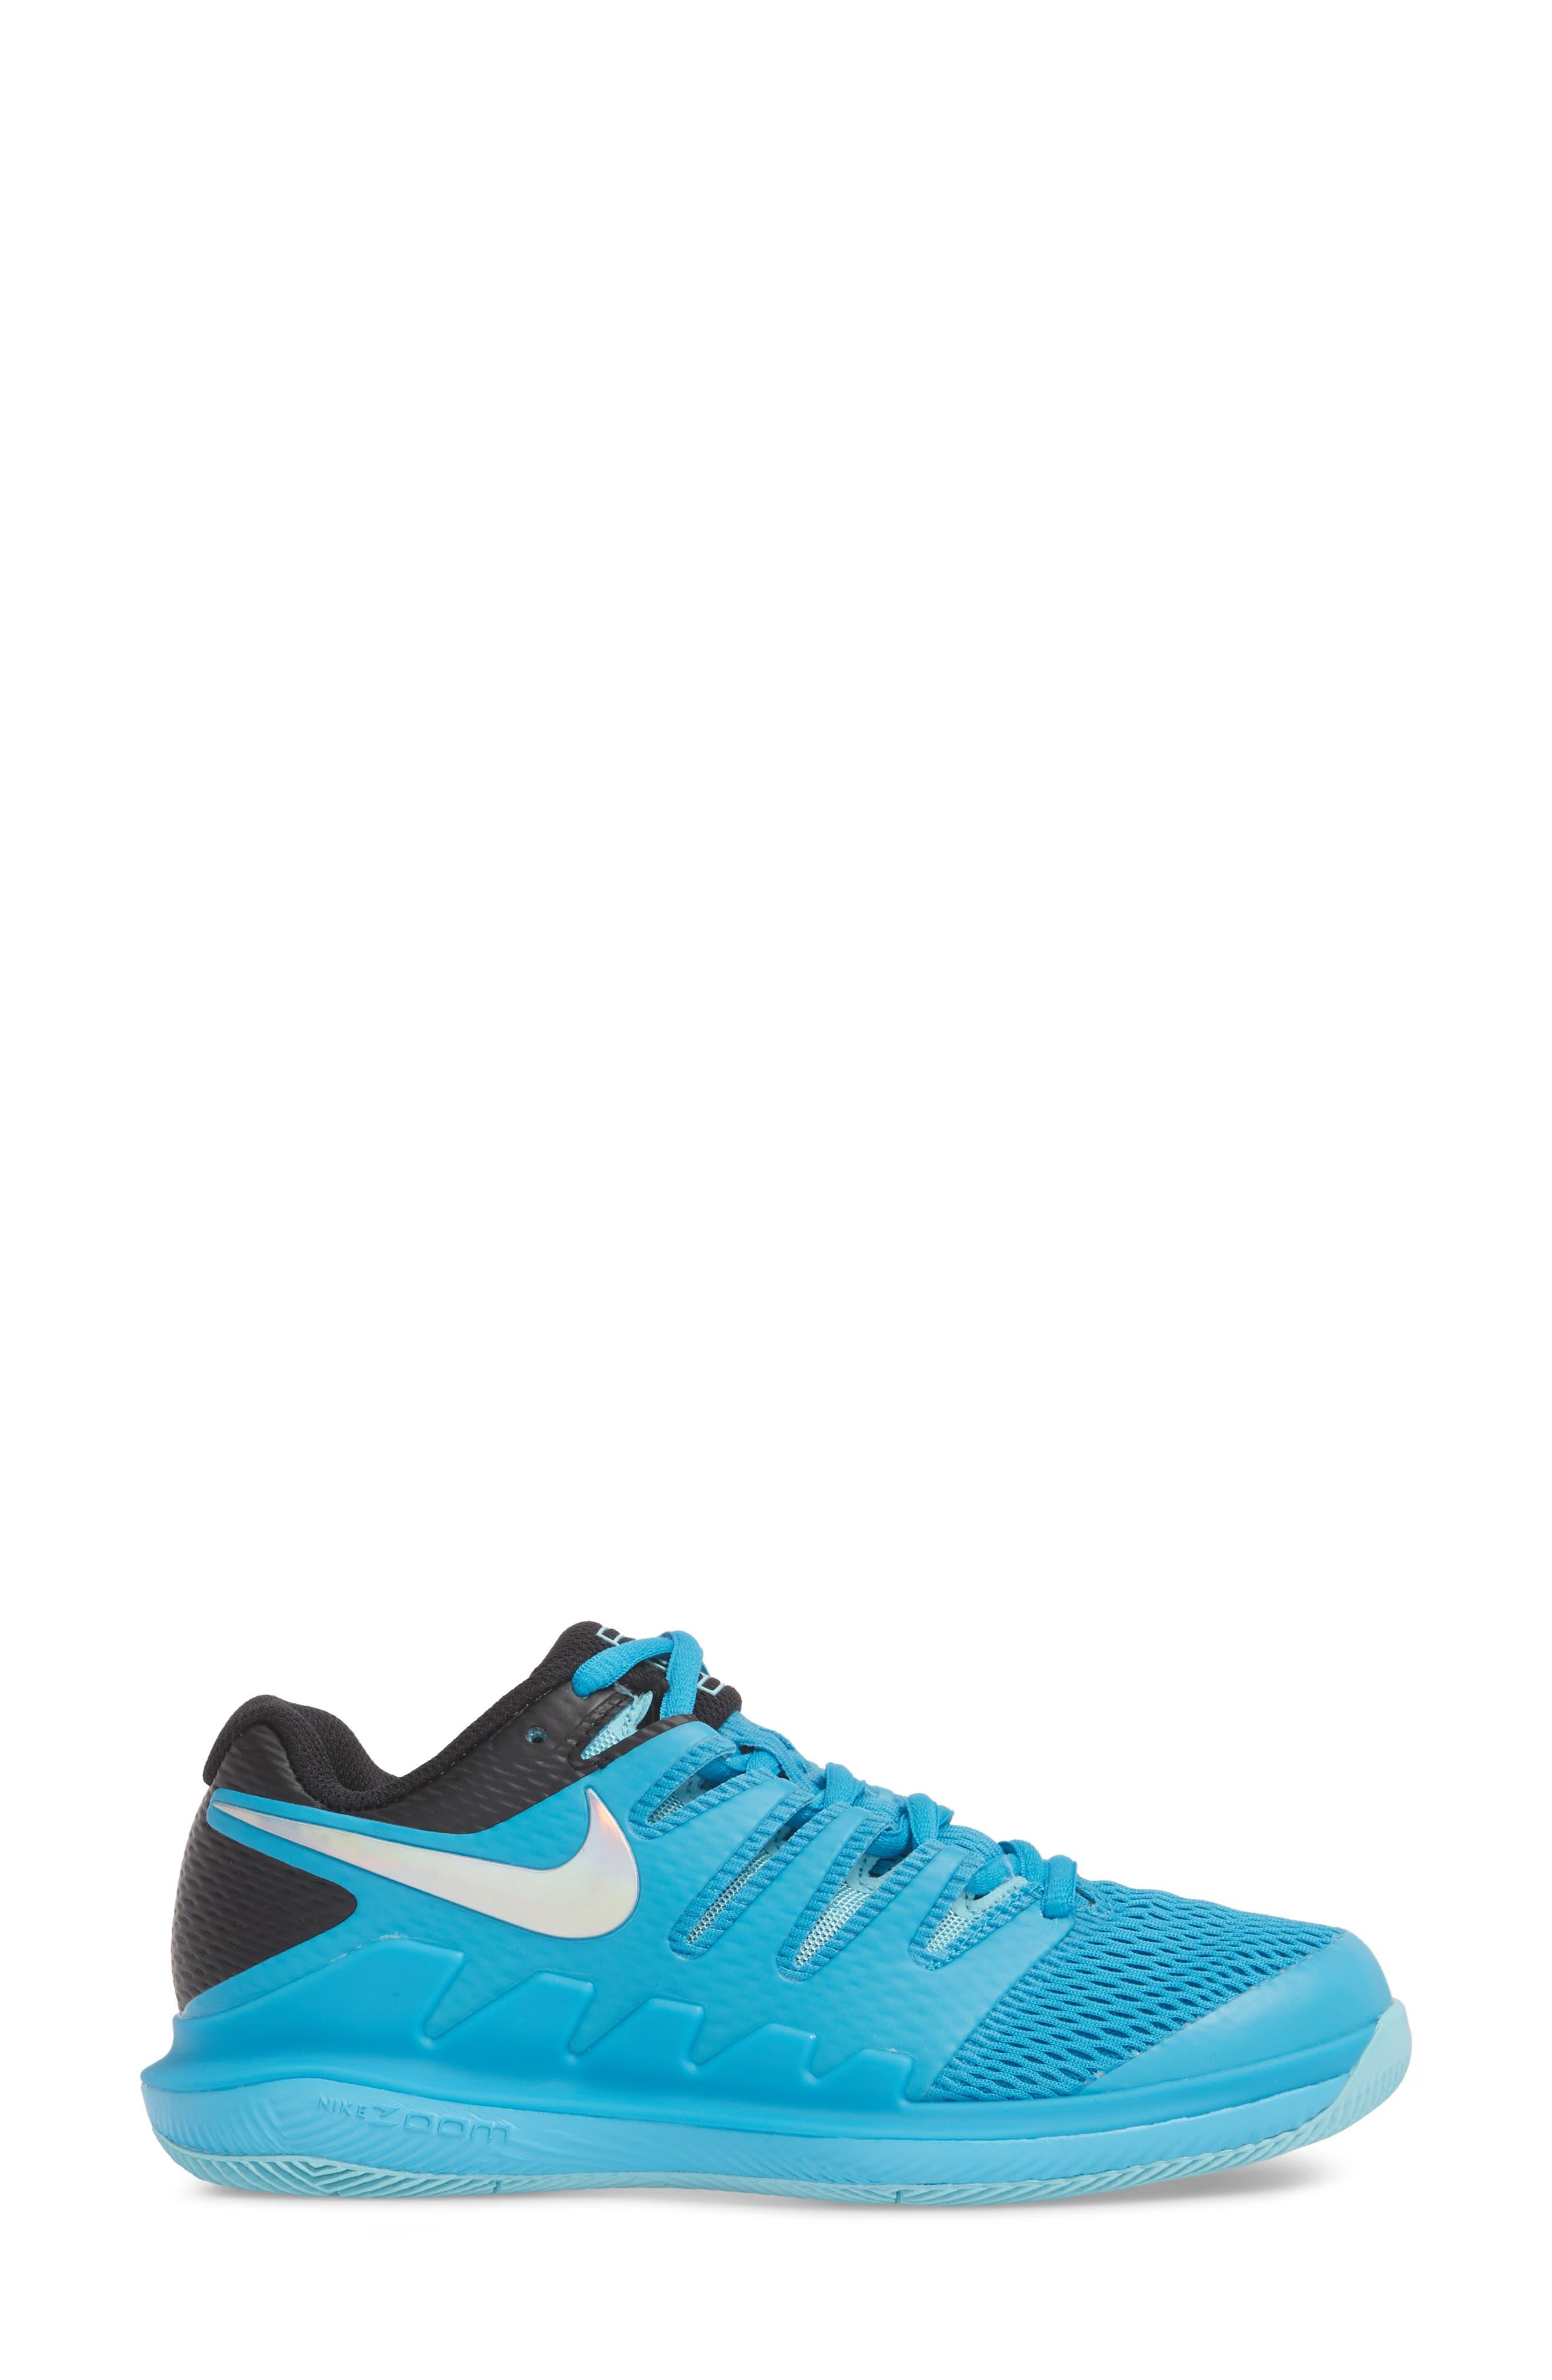 Air Zoom Vapor X Tennis Shoe,                             Alternate thumbnail 3, color,                             Light Blue Fury